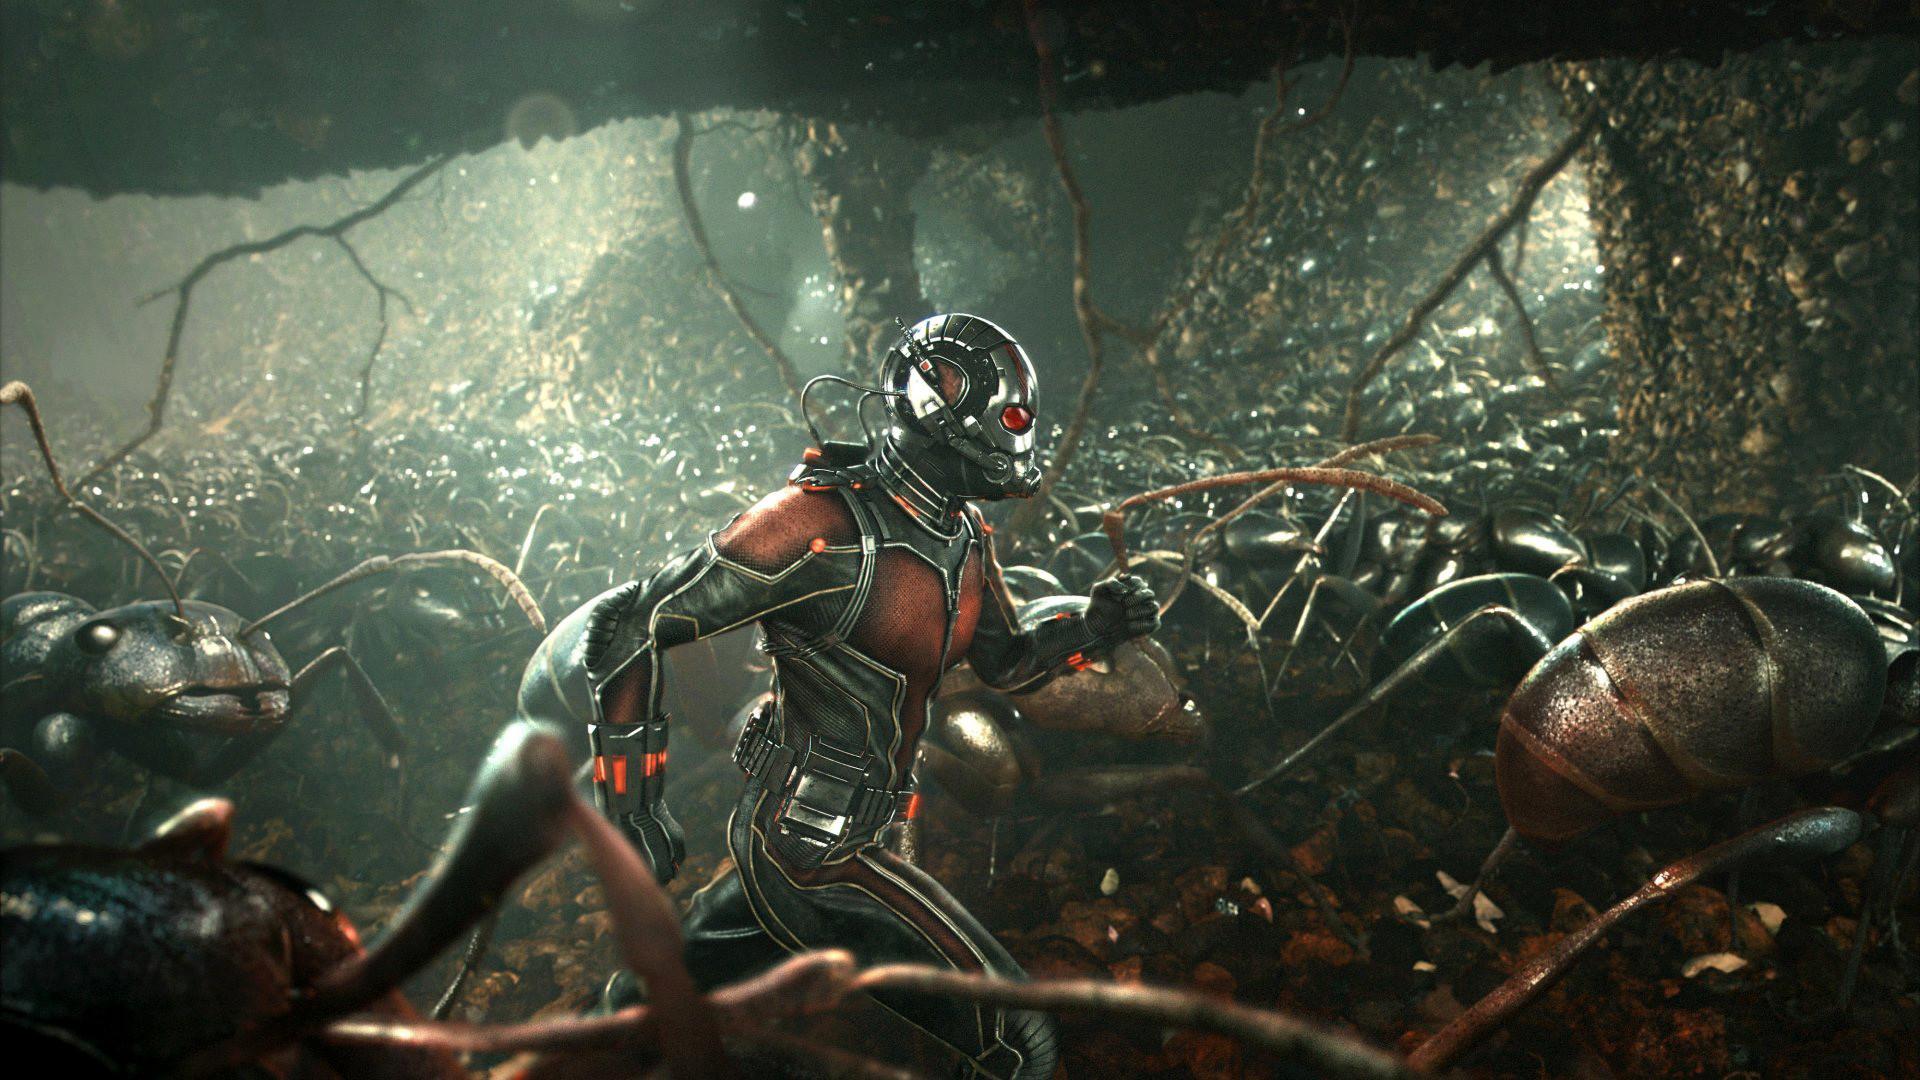 1920x1080 Ant Man Wallpaper 45